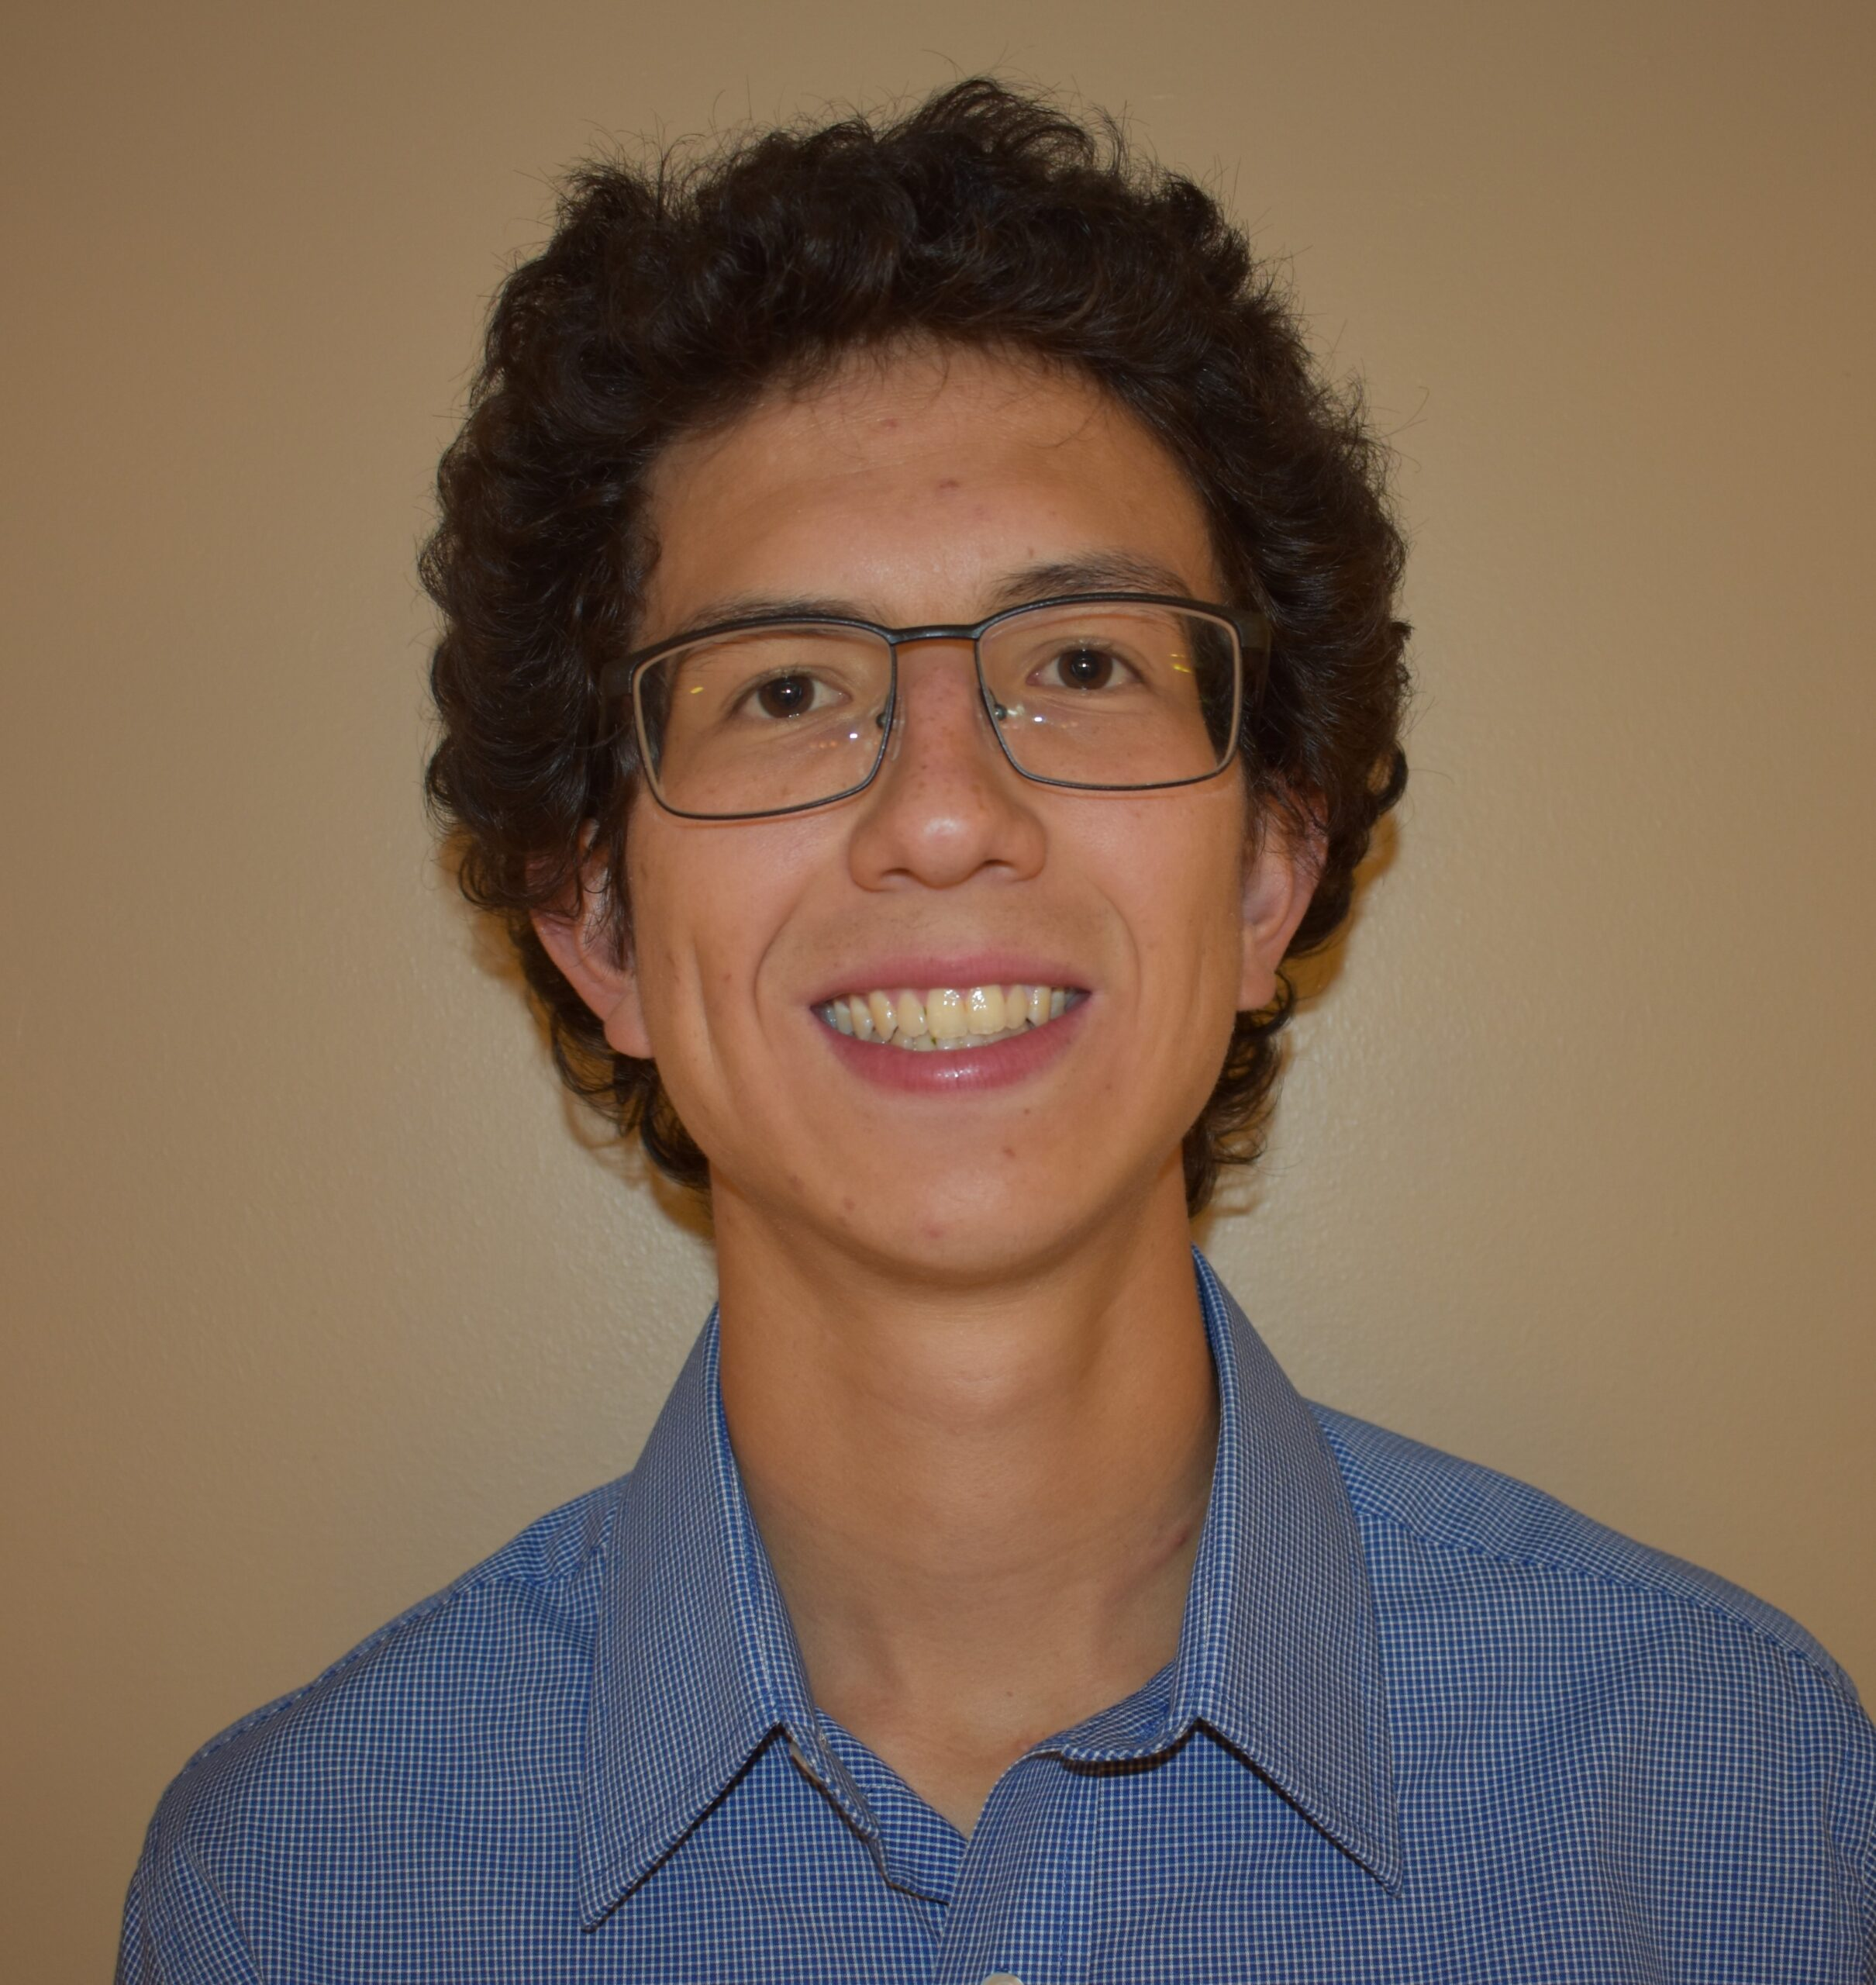 LSI welcomes graduate student Aaron Silva Trenkle